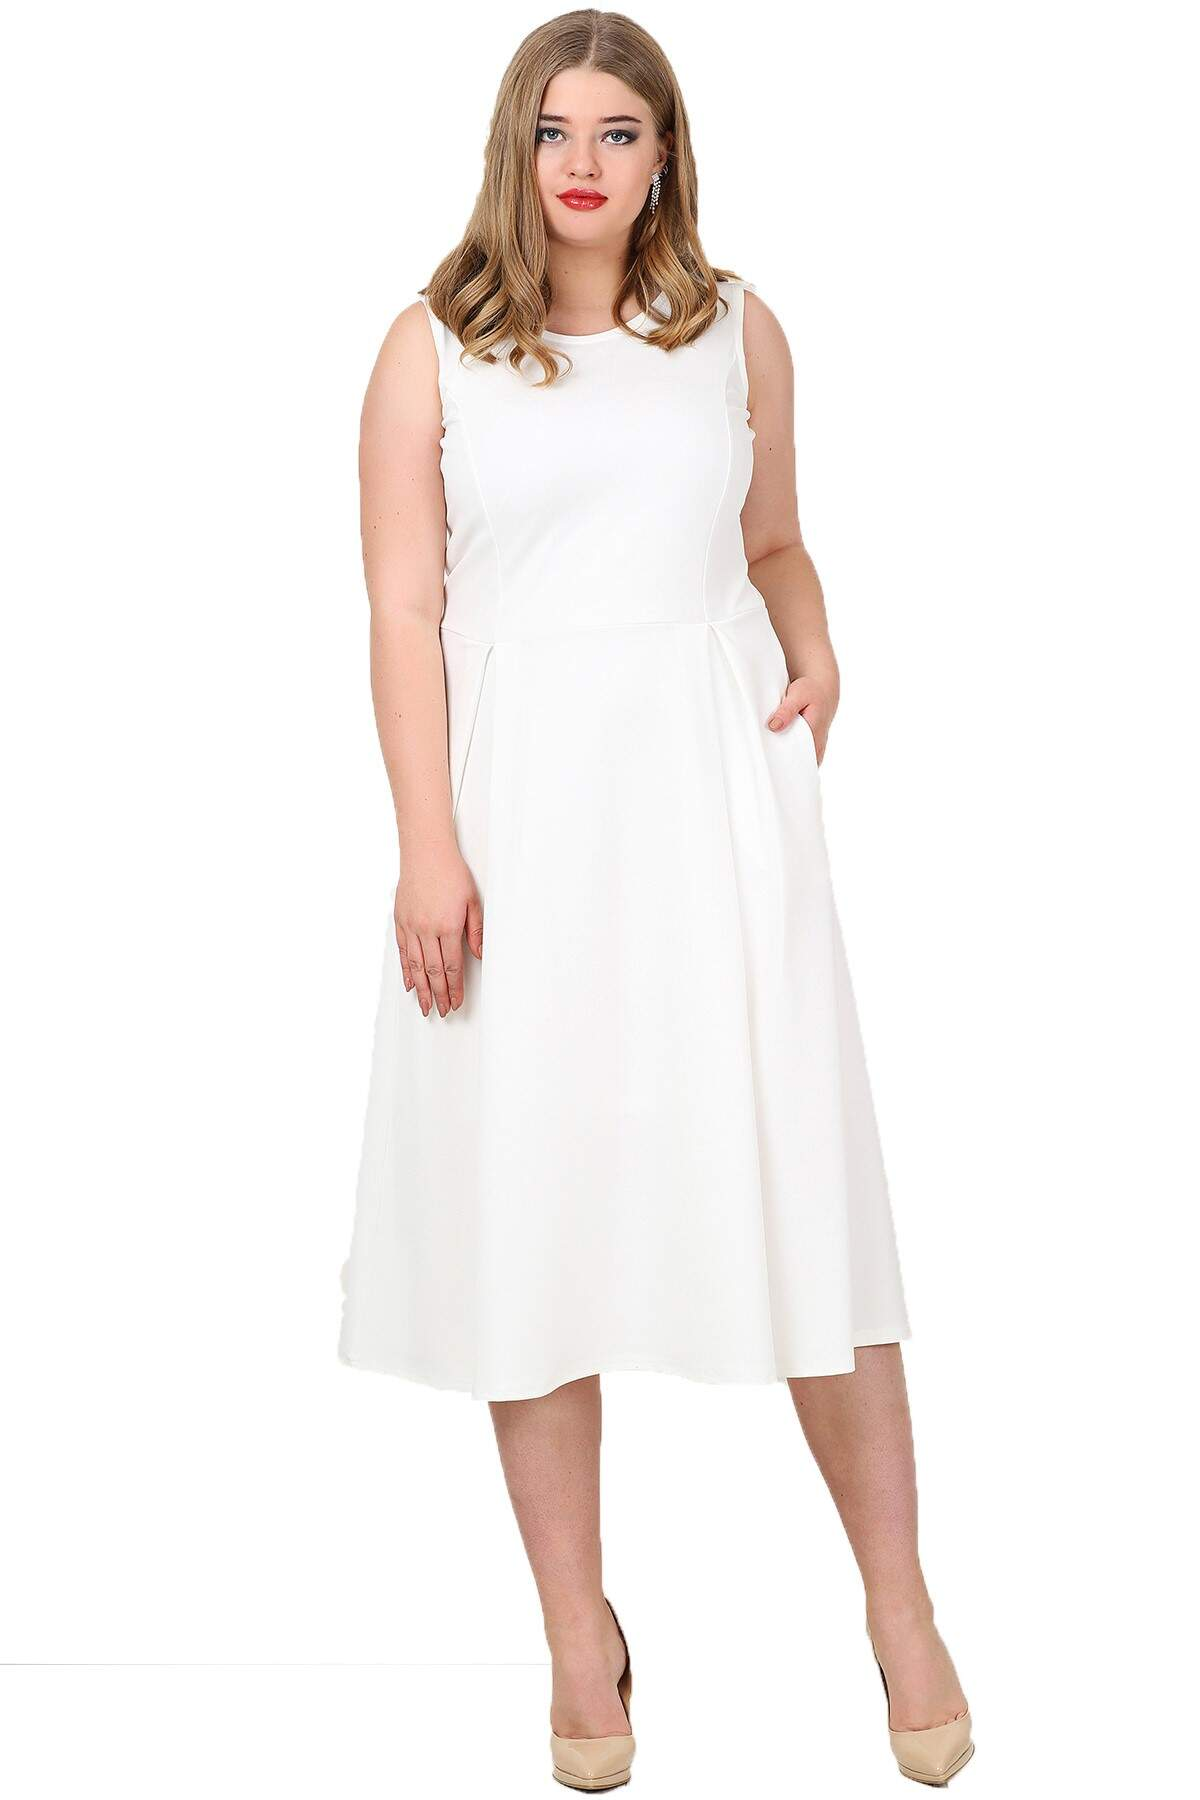 9378df0d3f1dc Plus Size Pockets Dress KL777 White